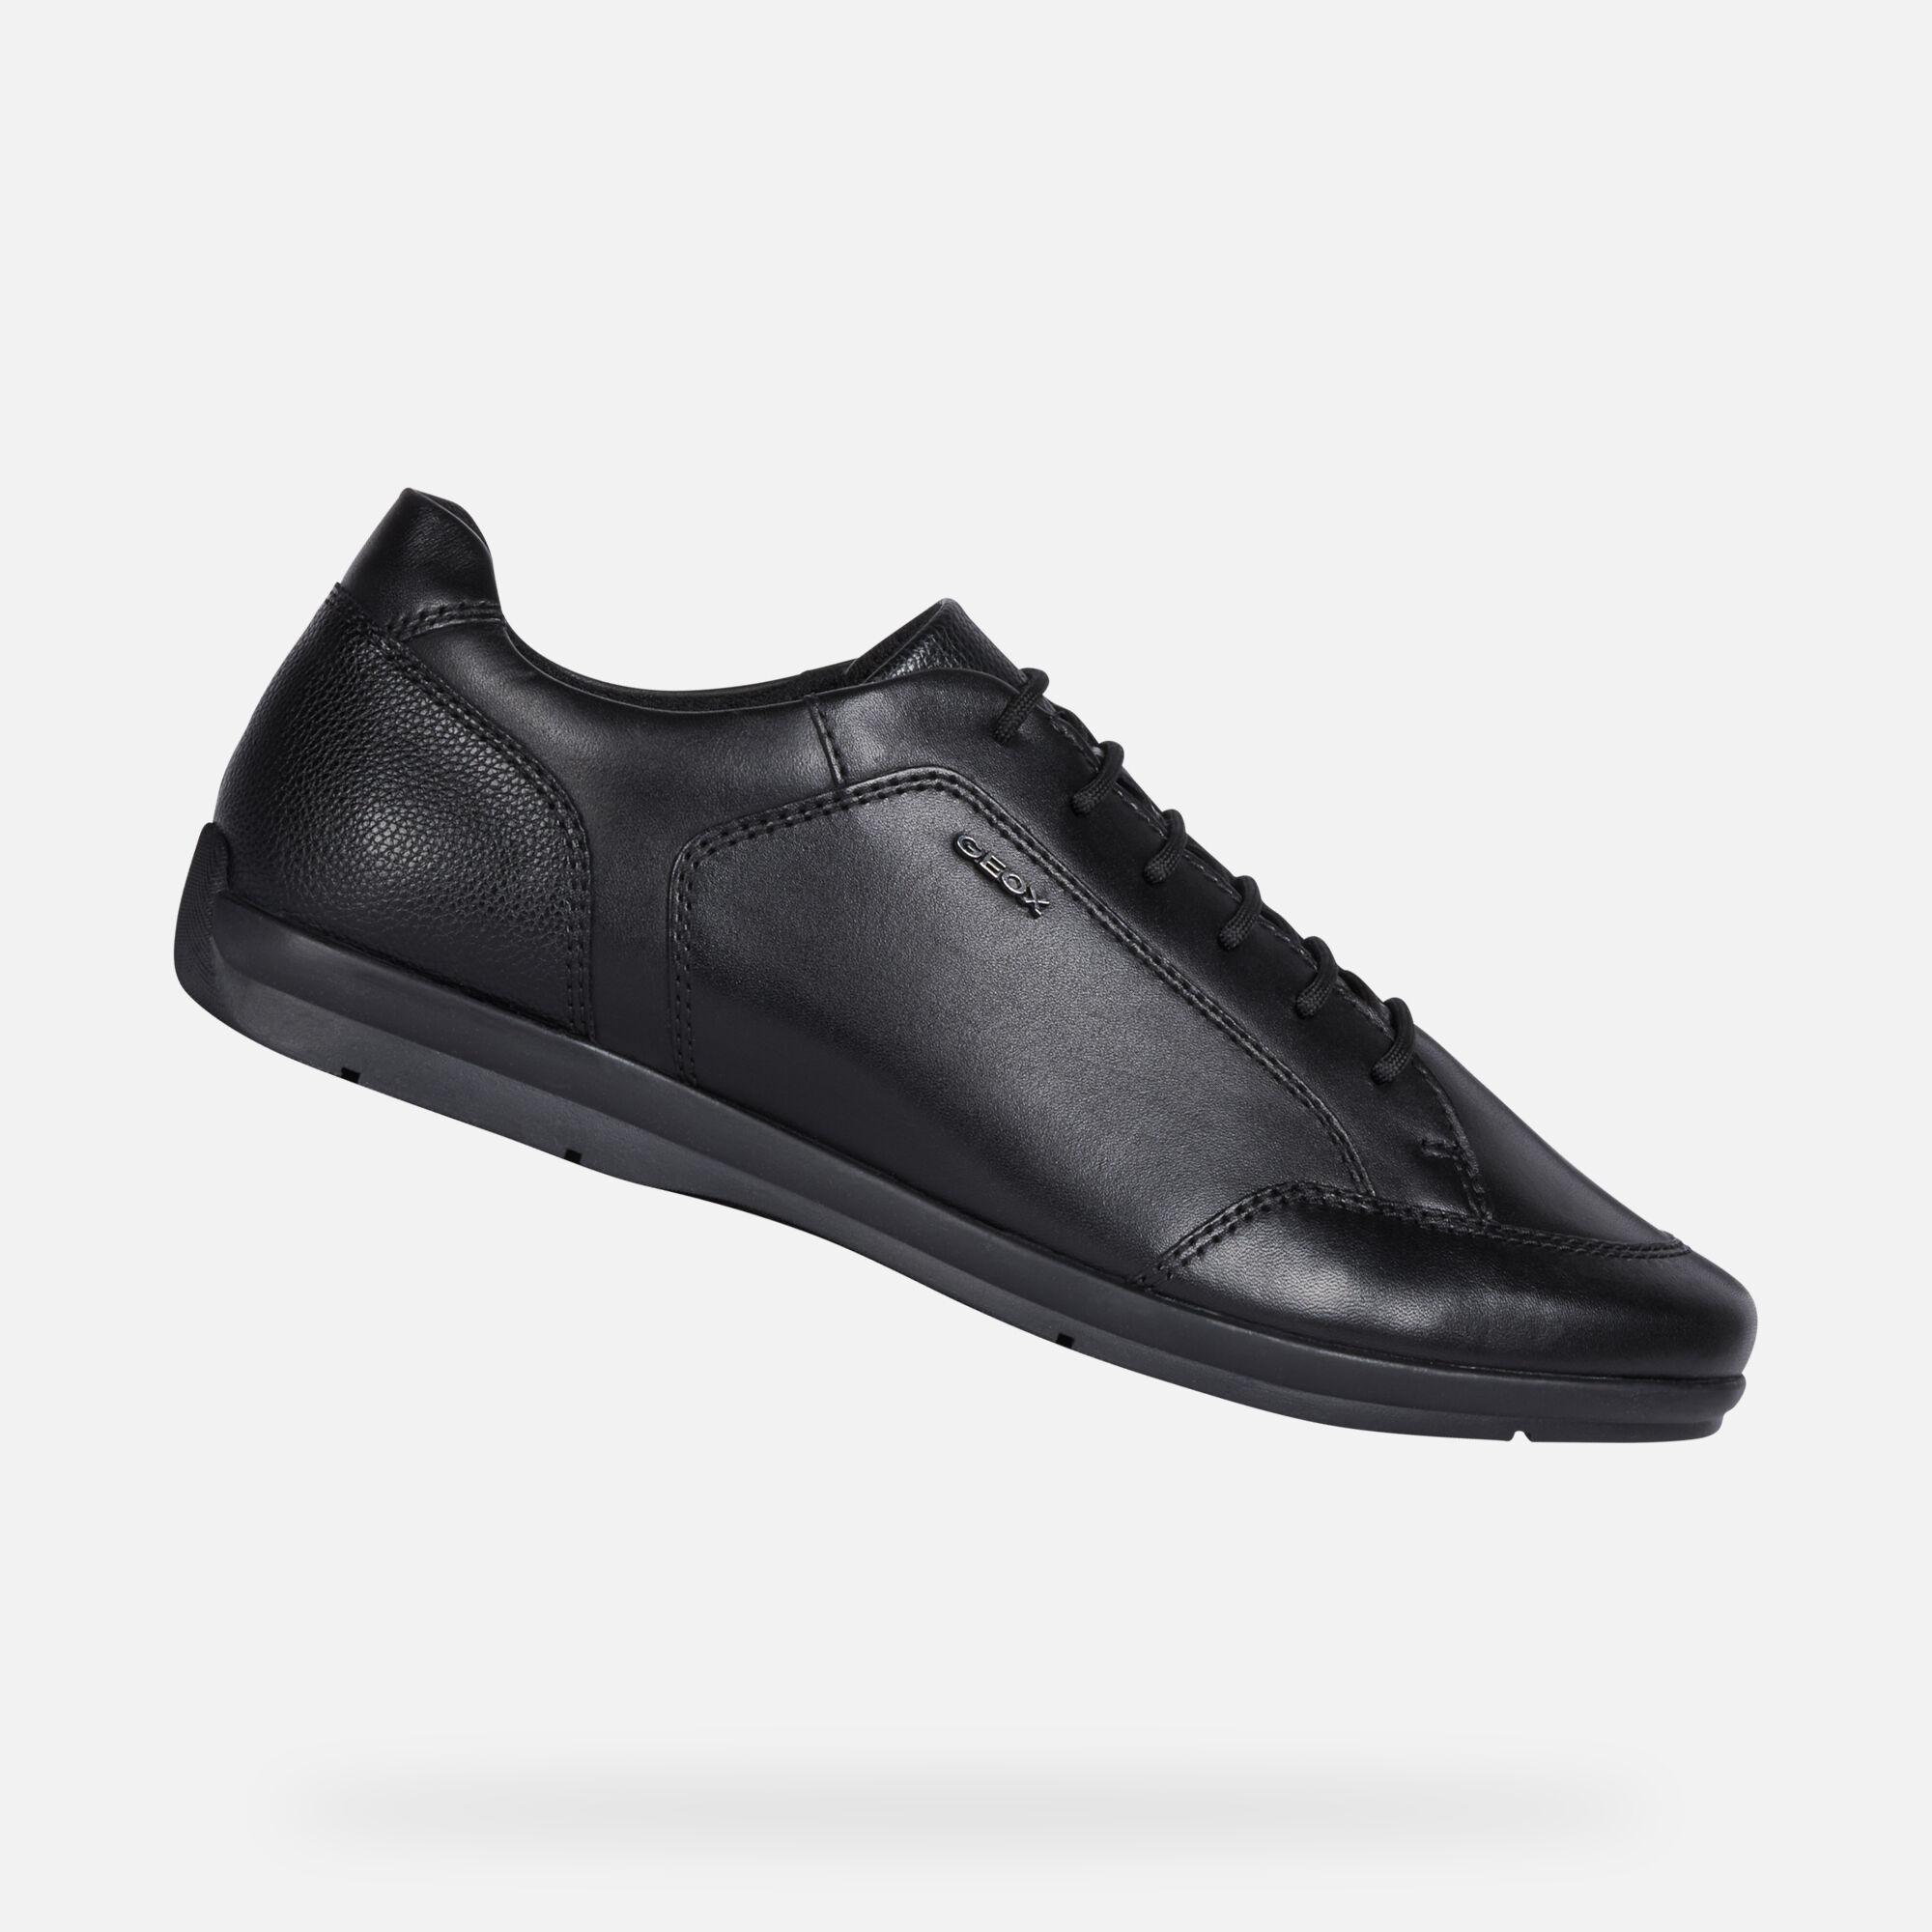 Geox ADRIEN Man: Black Shoes | FW20 Geox